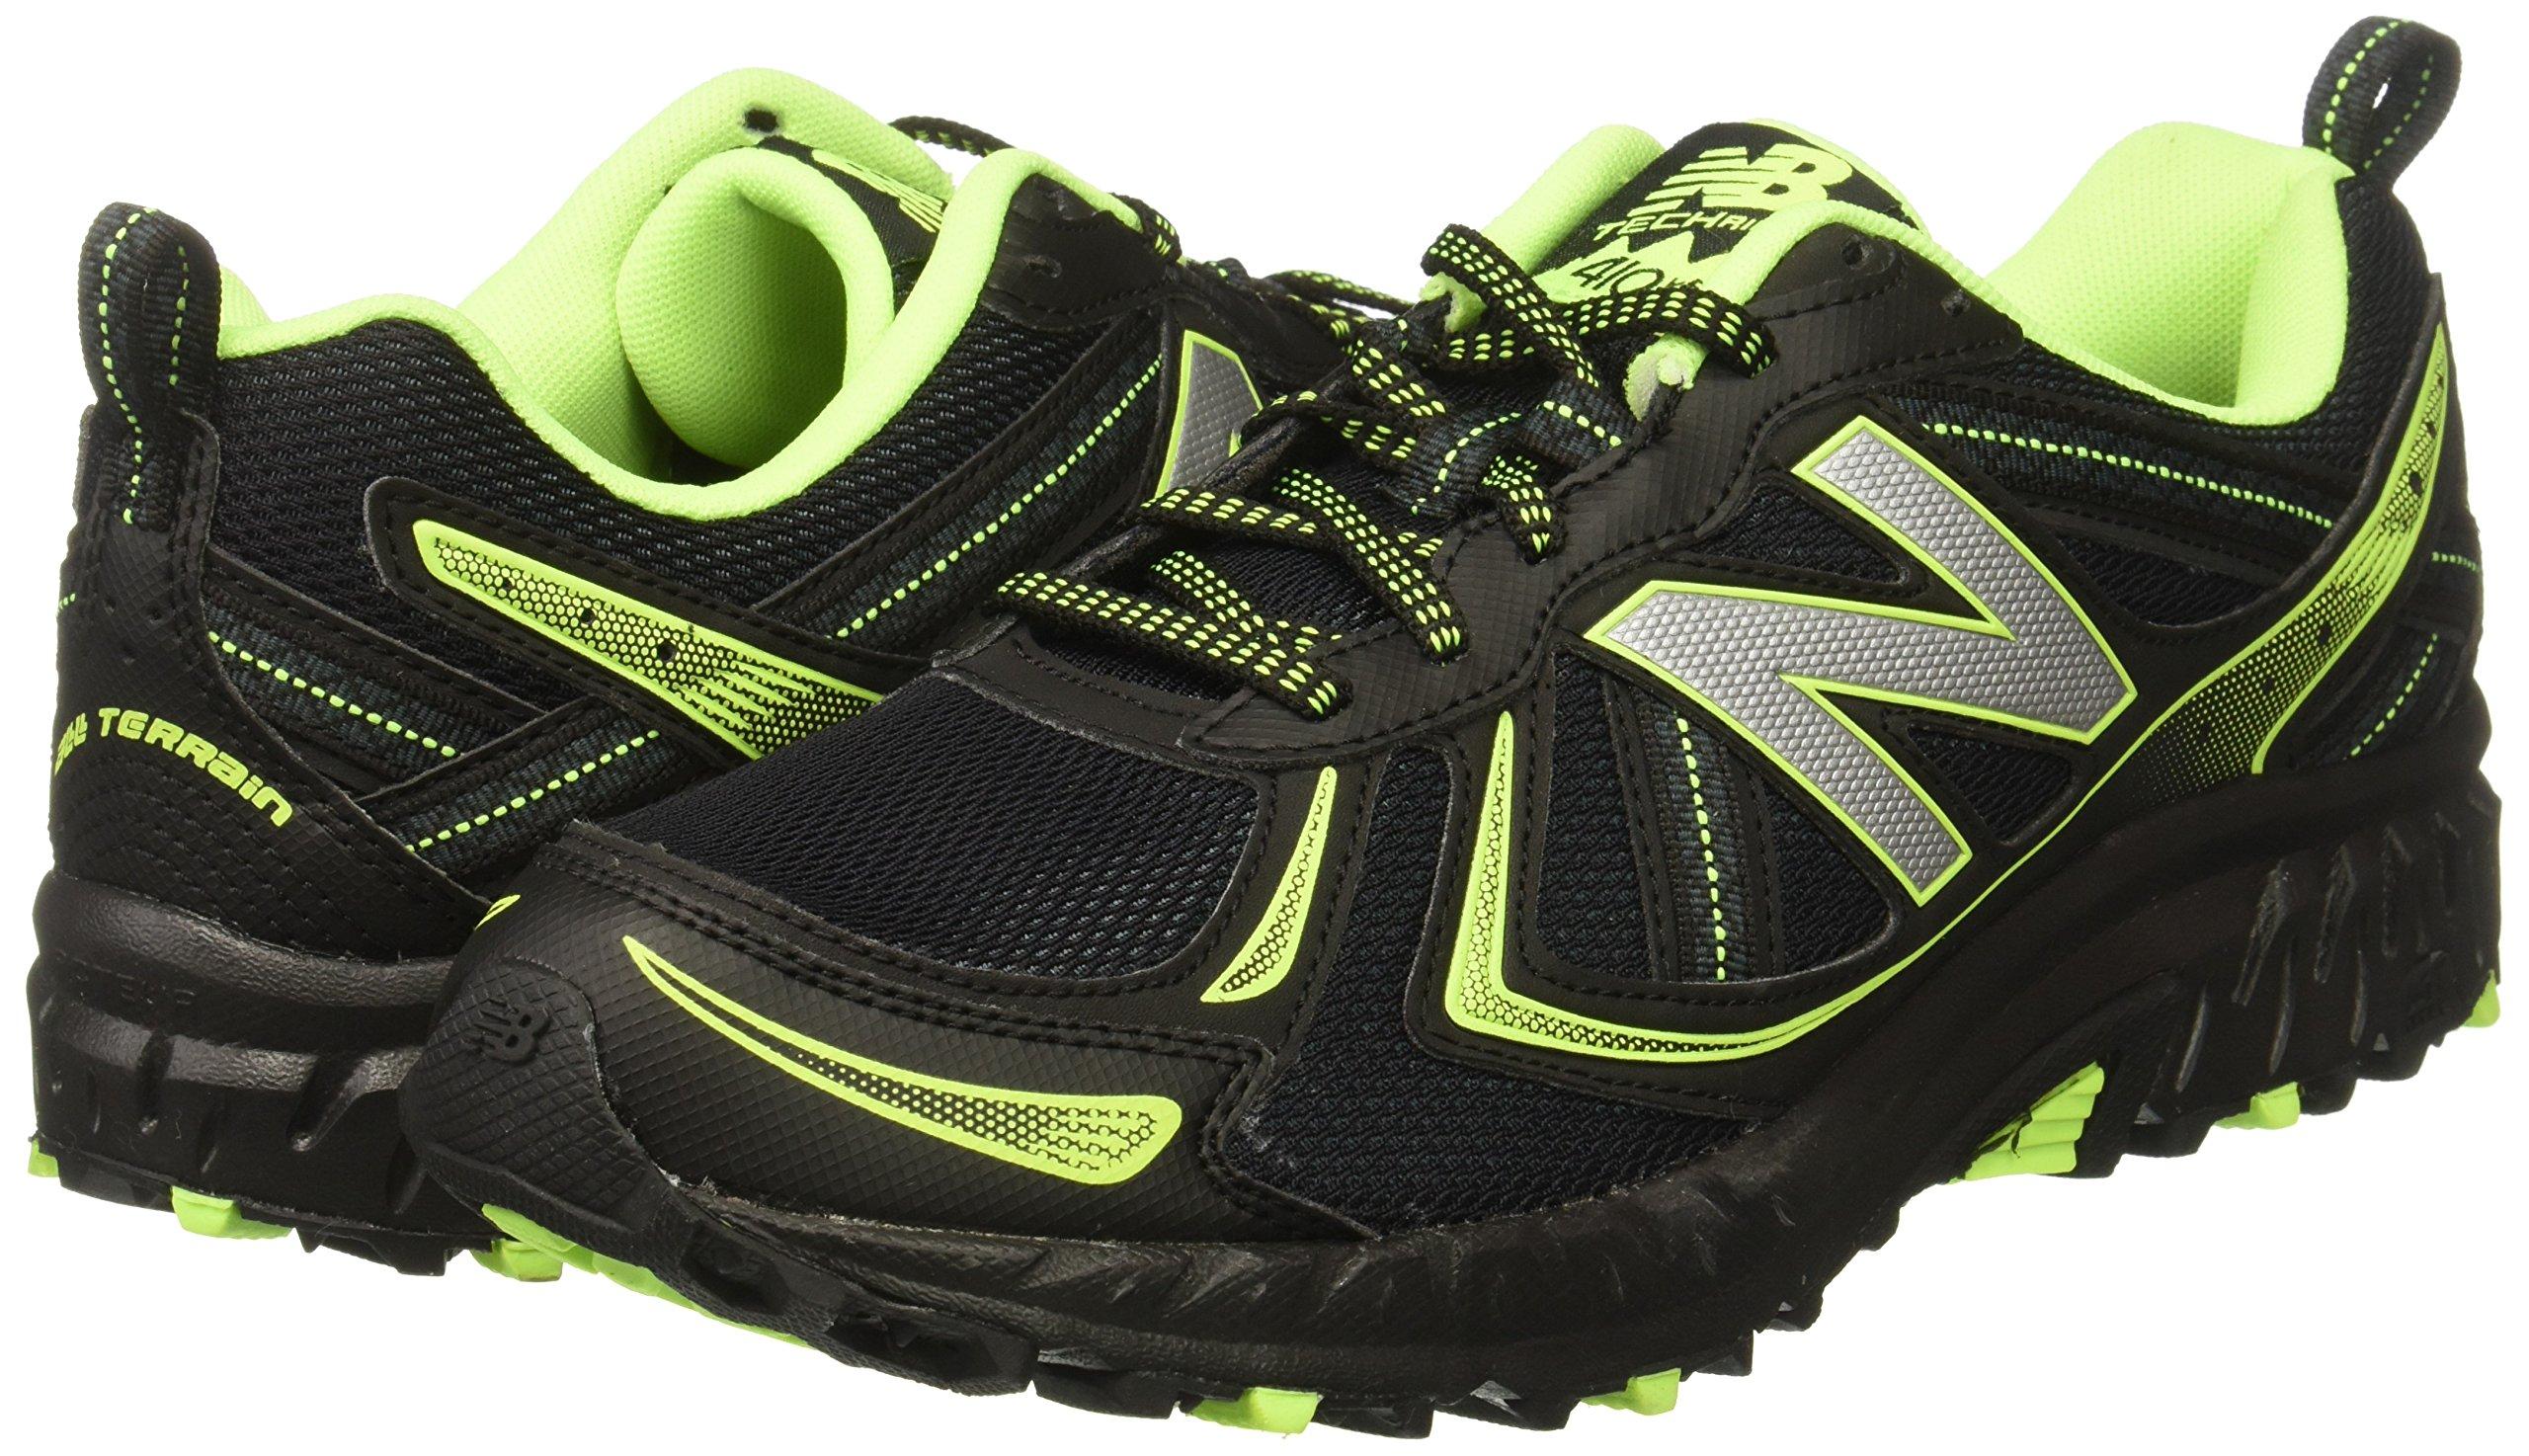 New Balance Men's MT410v5 Cushioning Trail Running Shoe, Black, 8 D US by New Balance (Image #6)